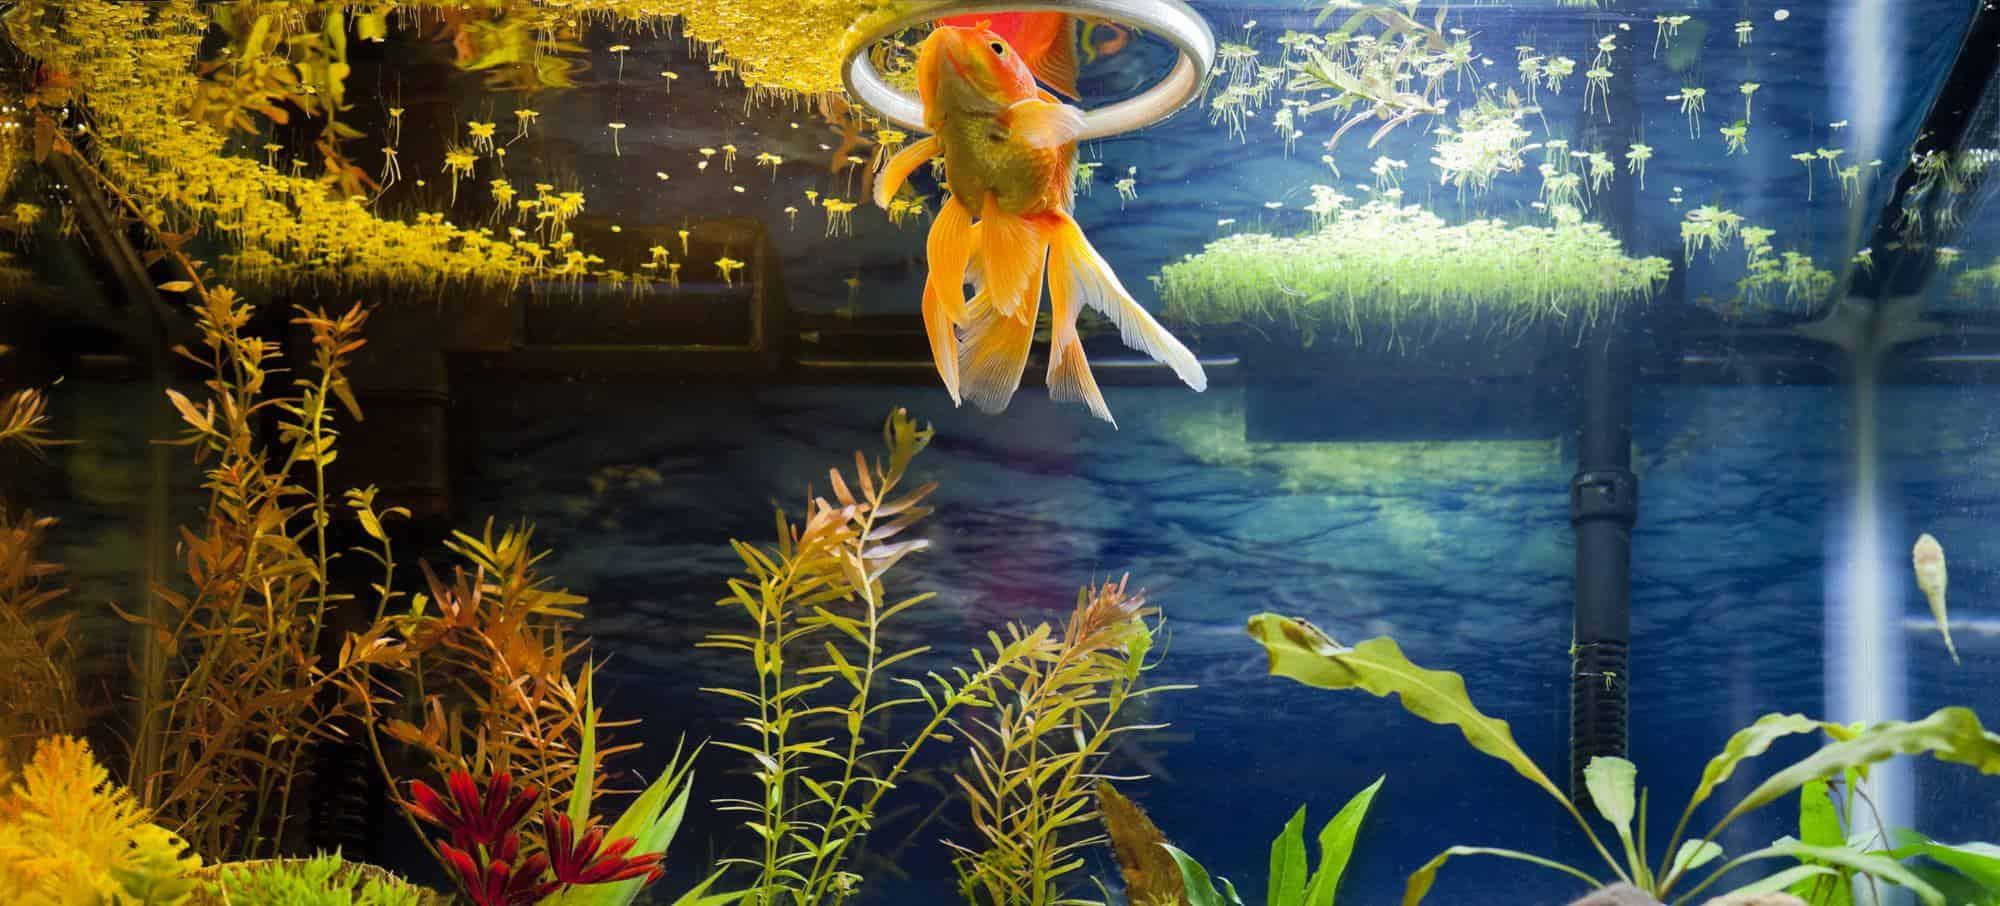 duckweed on top of aquarium